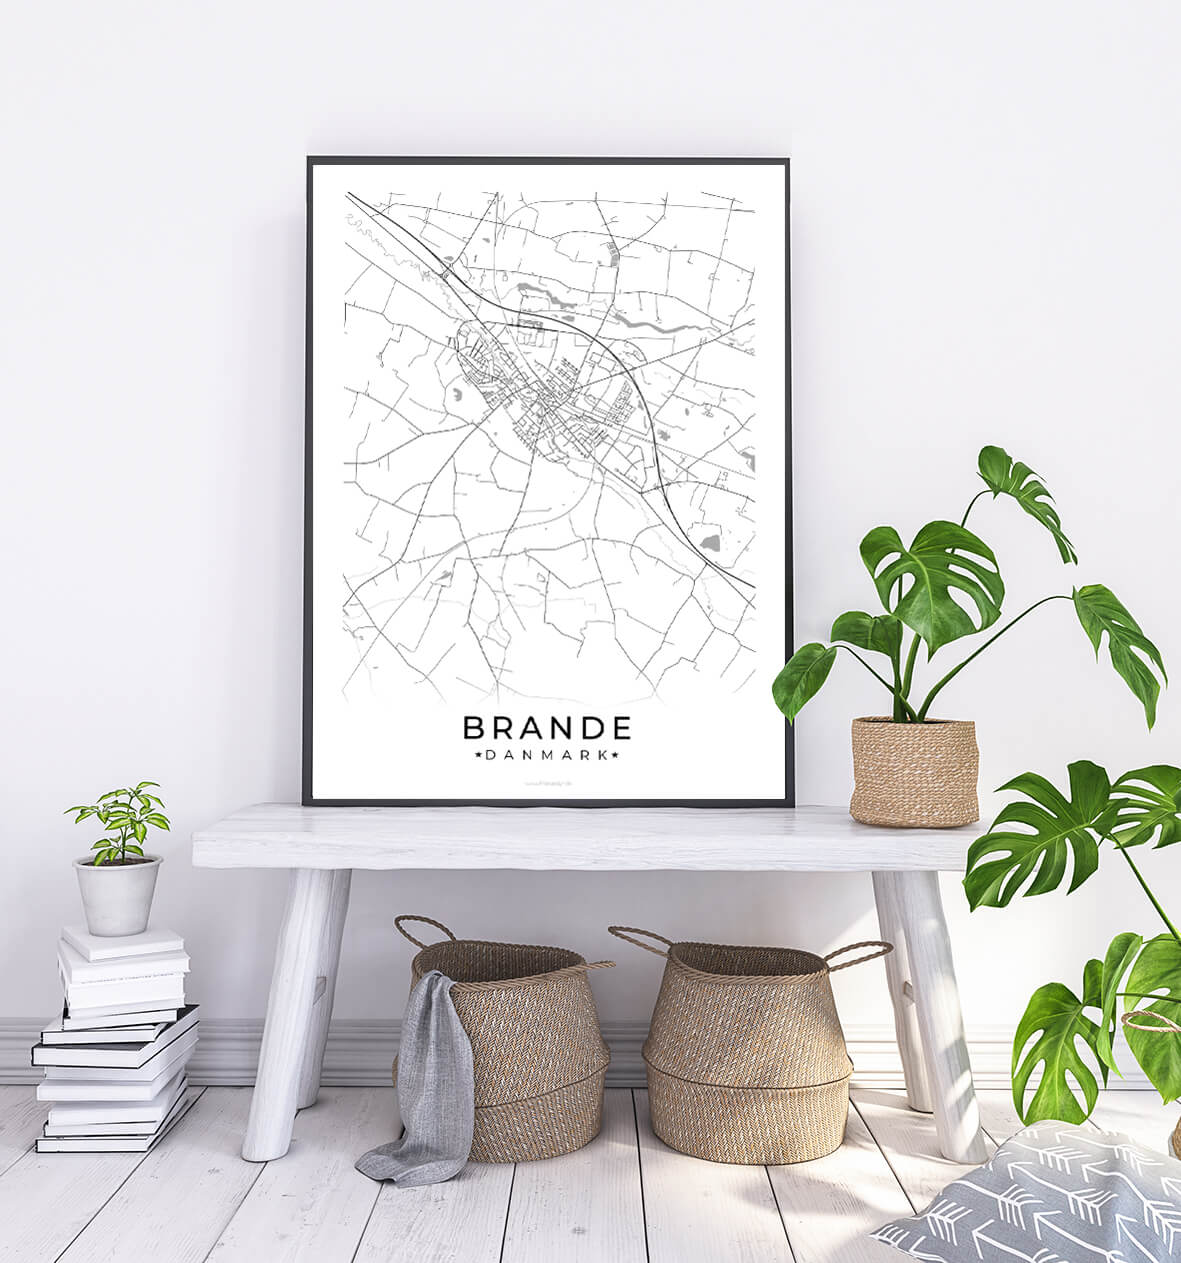 Brande-hvid-byplakat-1